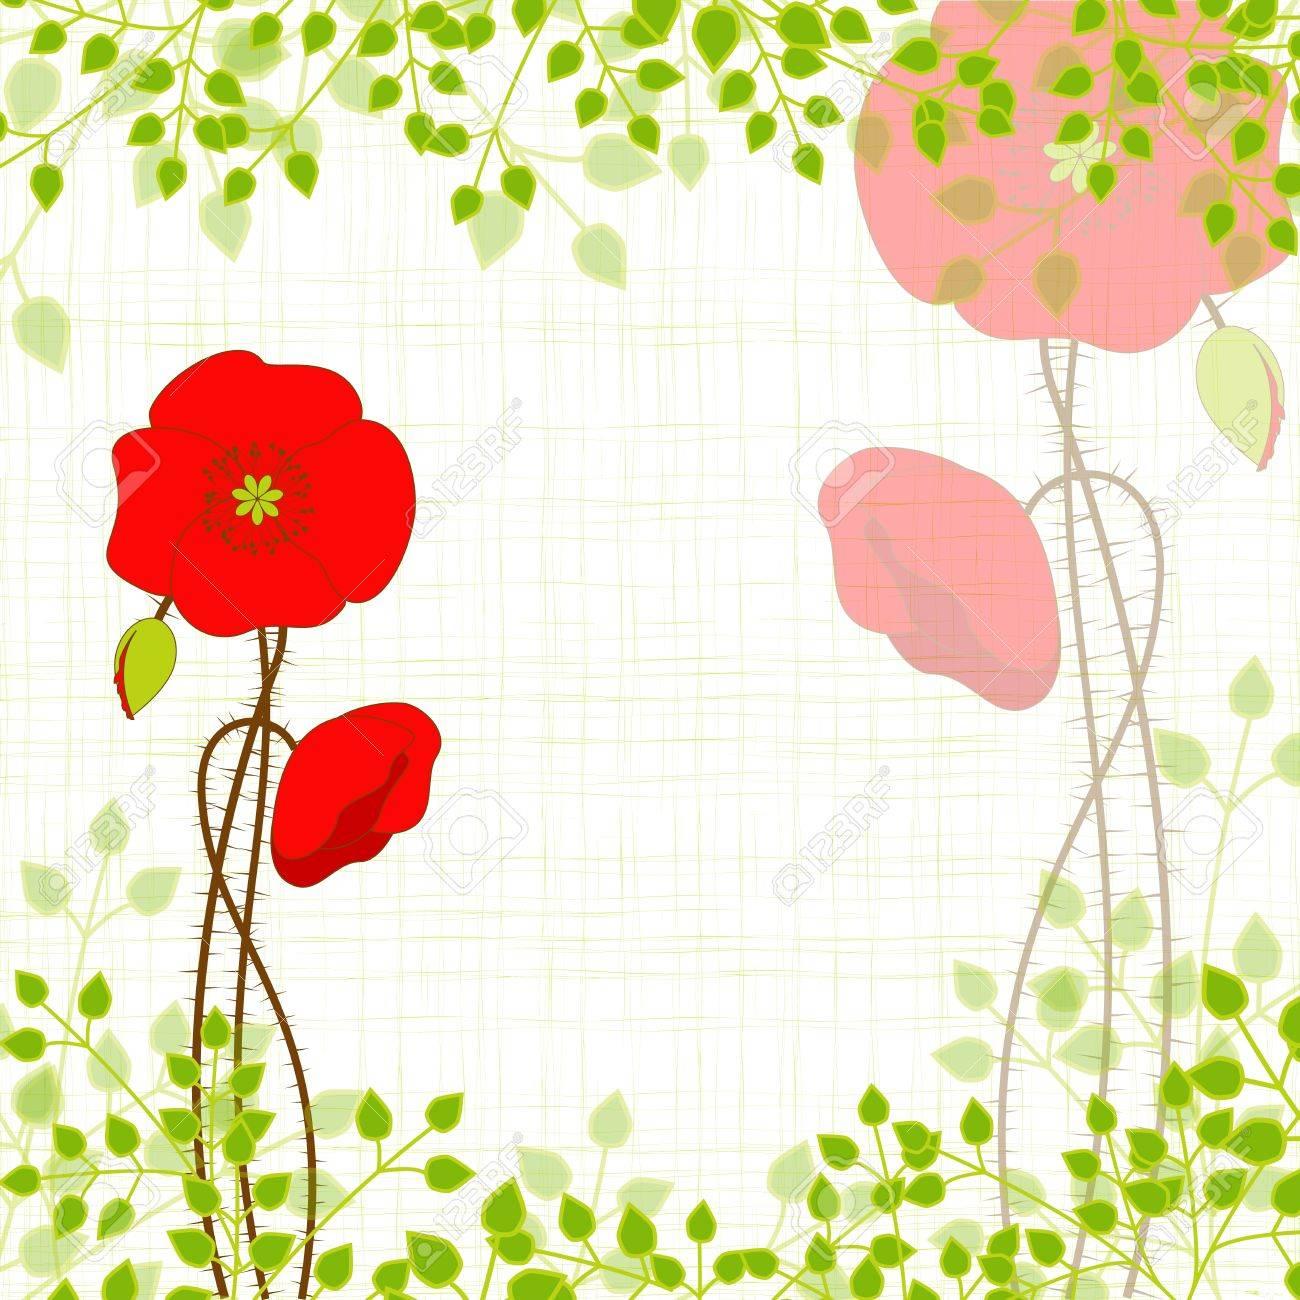 Springtime Red Poppy on Green Background Stock Vector - 18733535